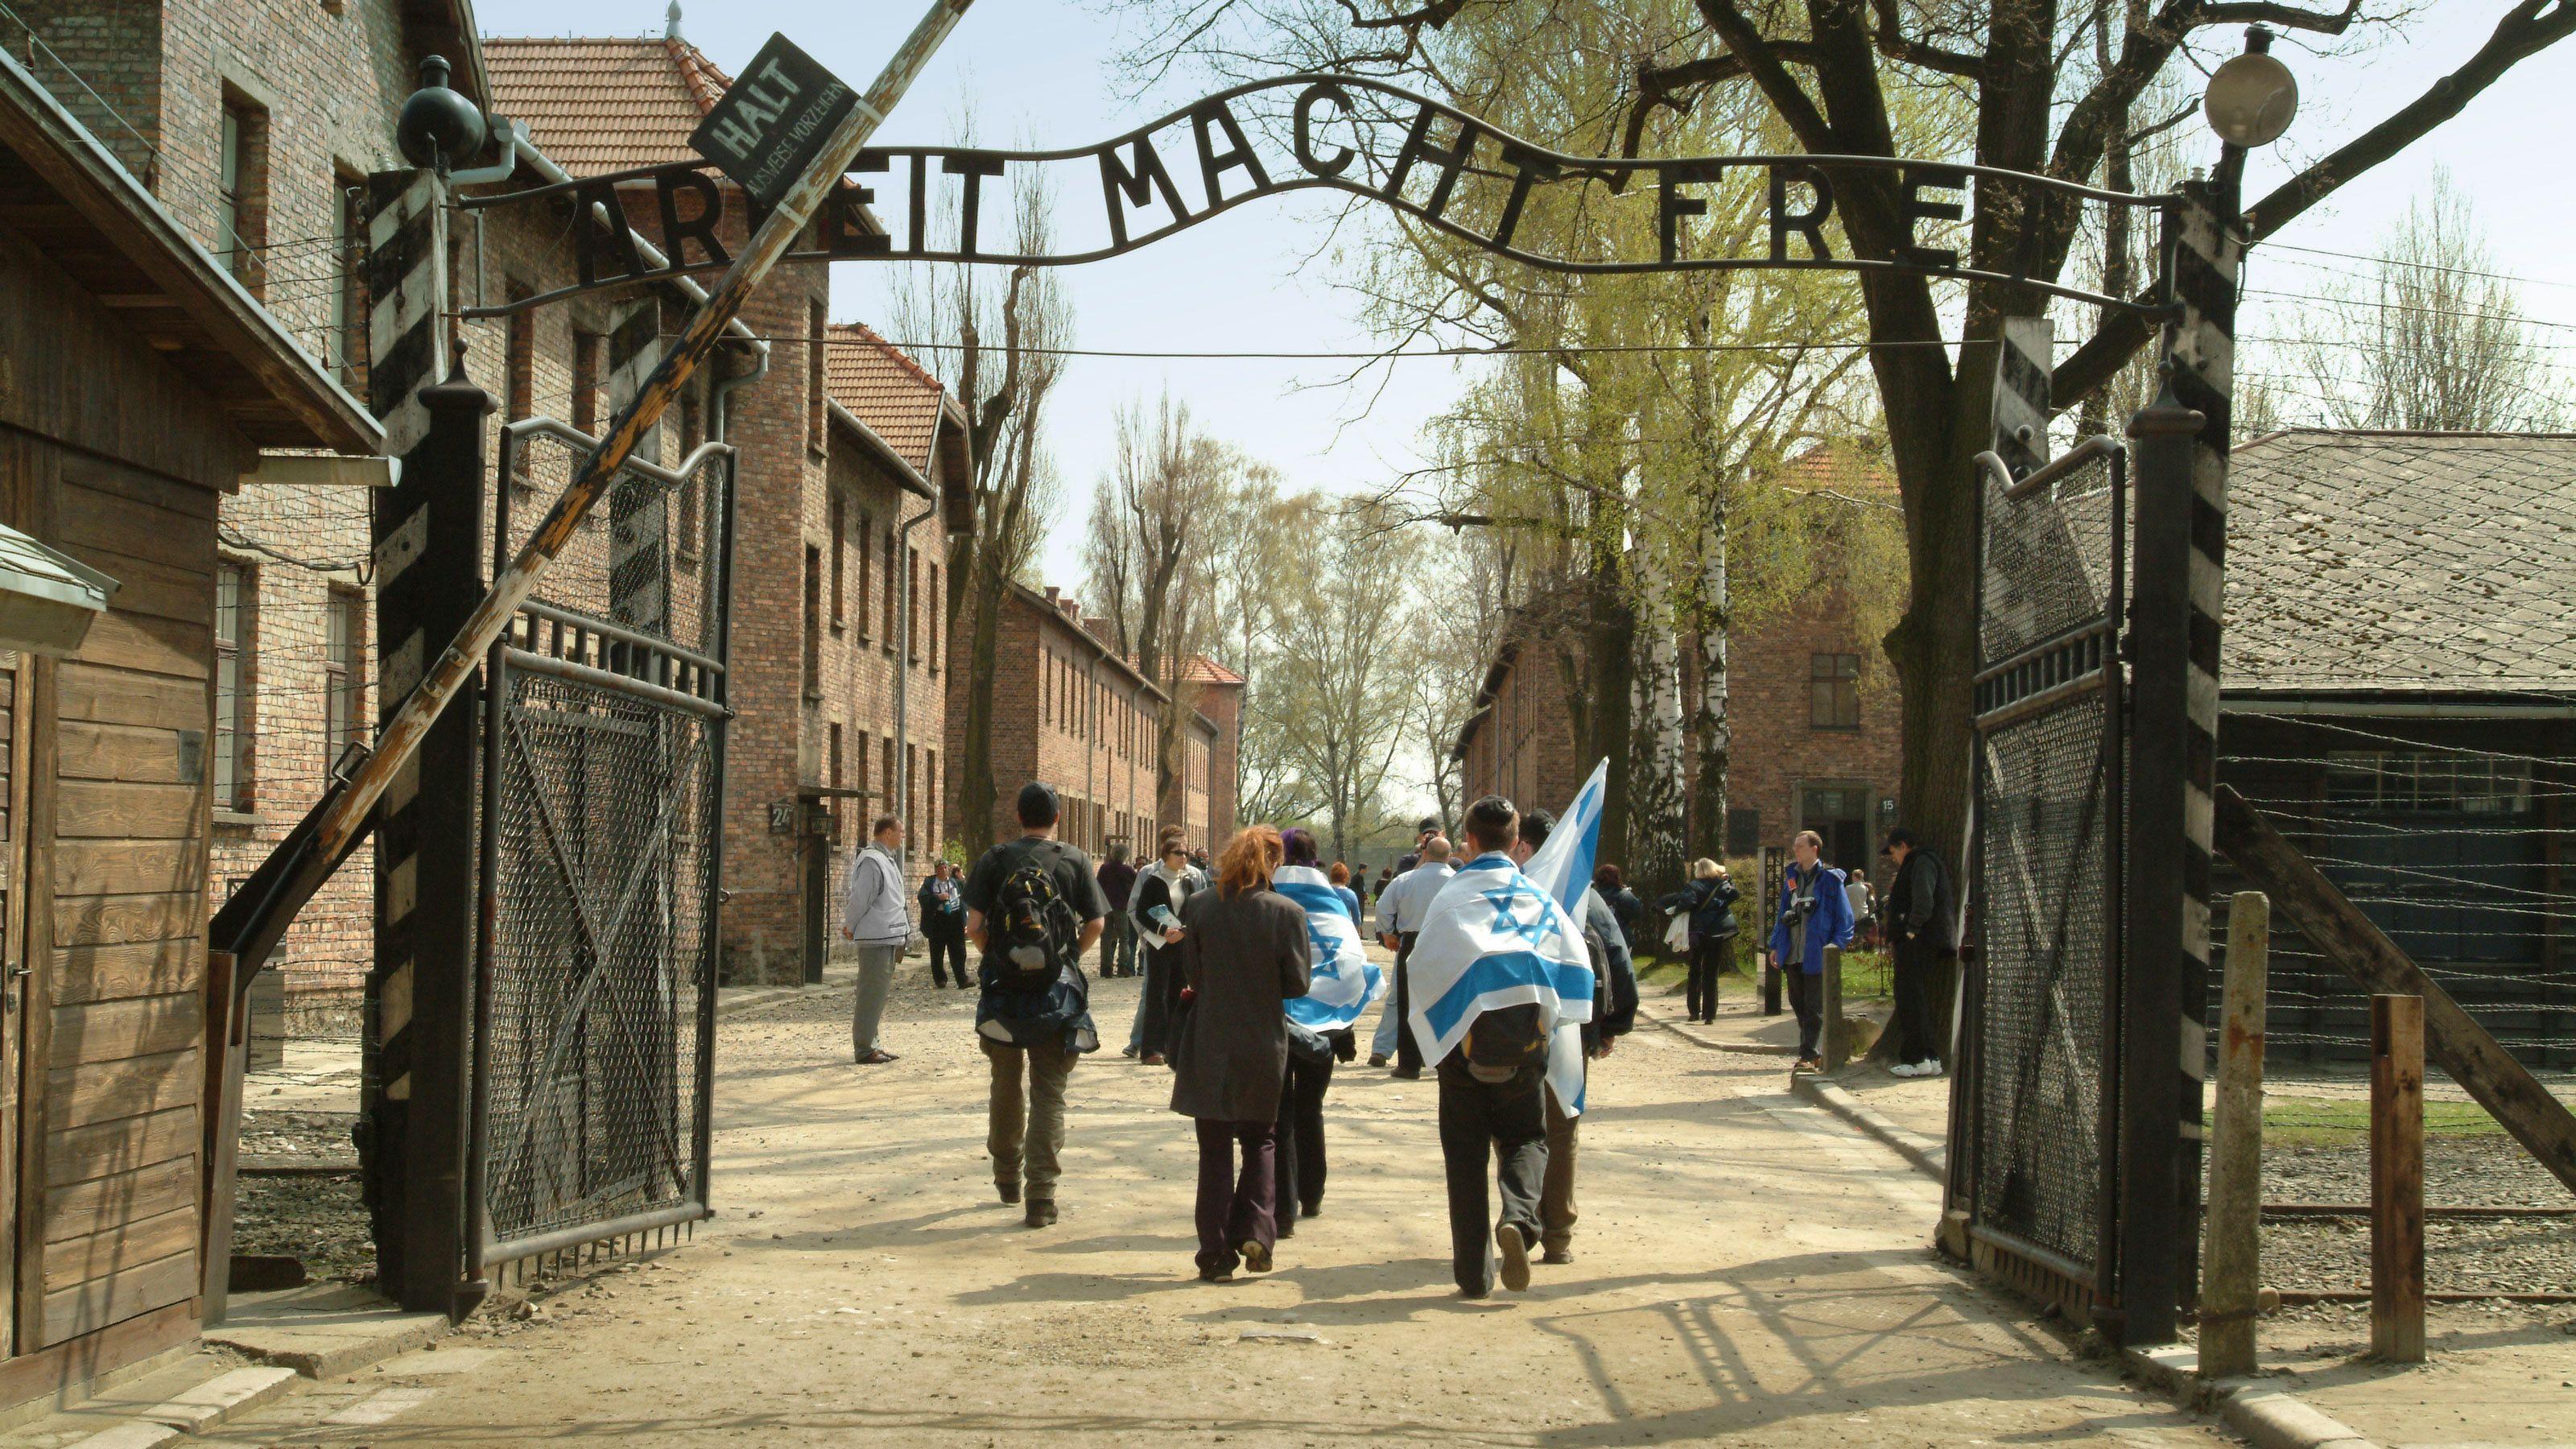 Auschwitz-Birkenau Concentration Camp Memorial Tour